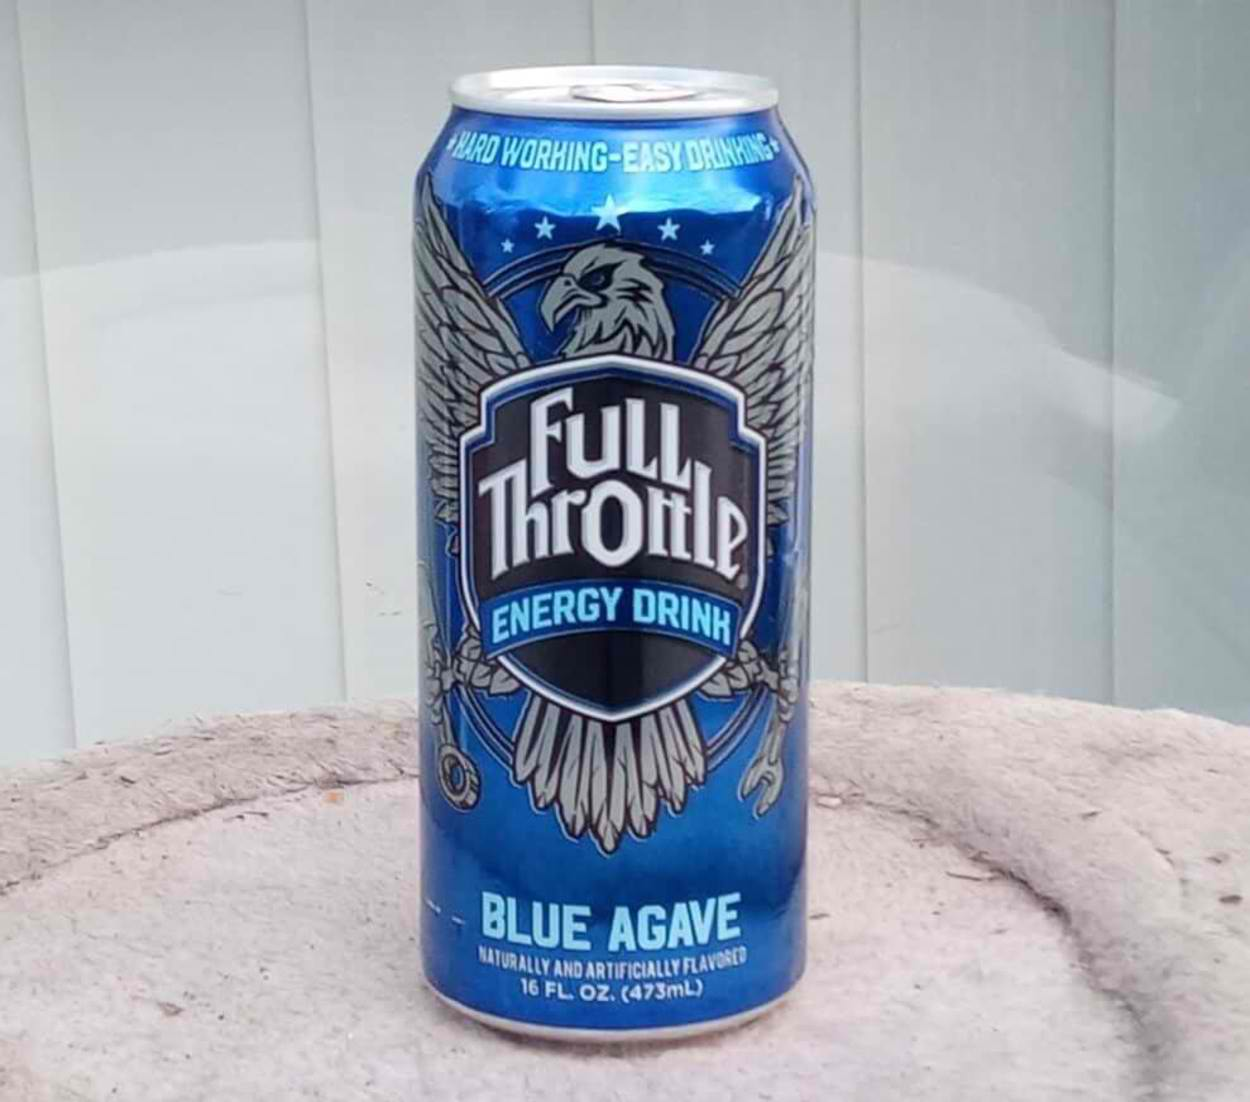 Full Throttle Caffeine and Ingredients (Essential)